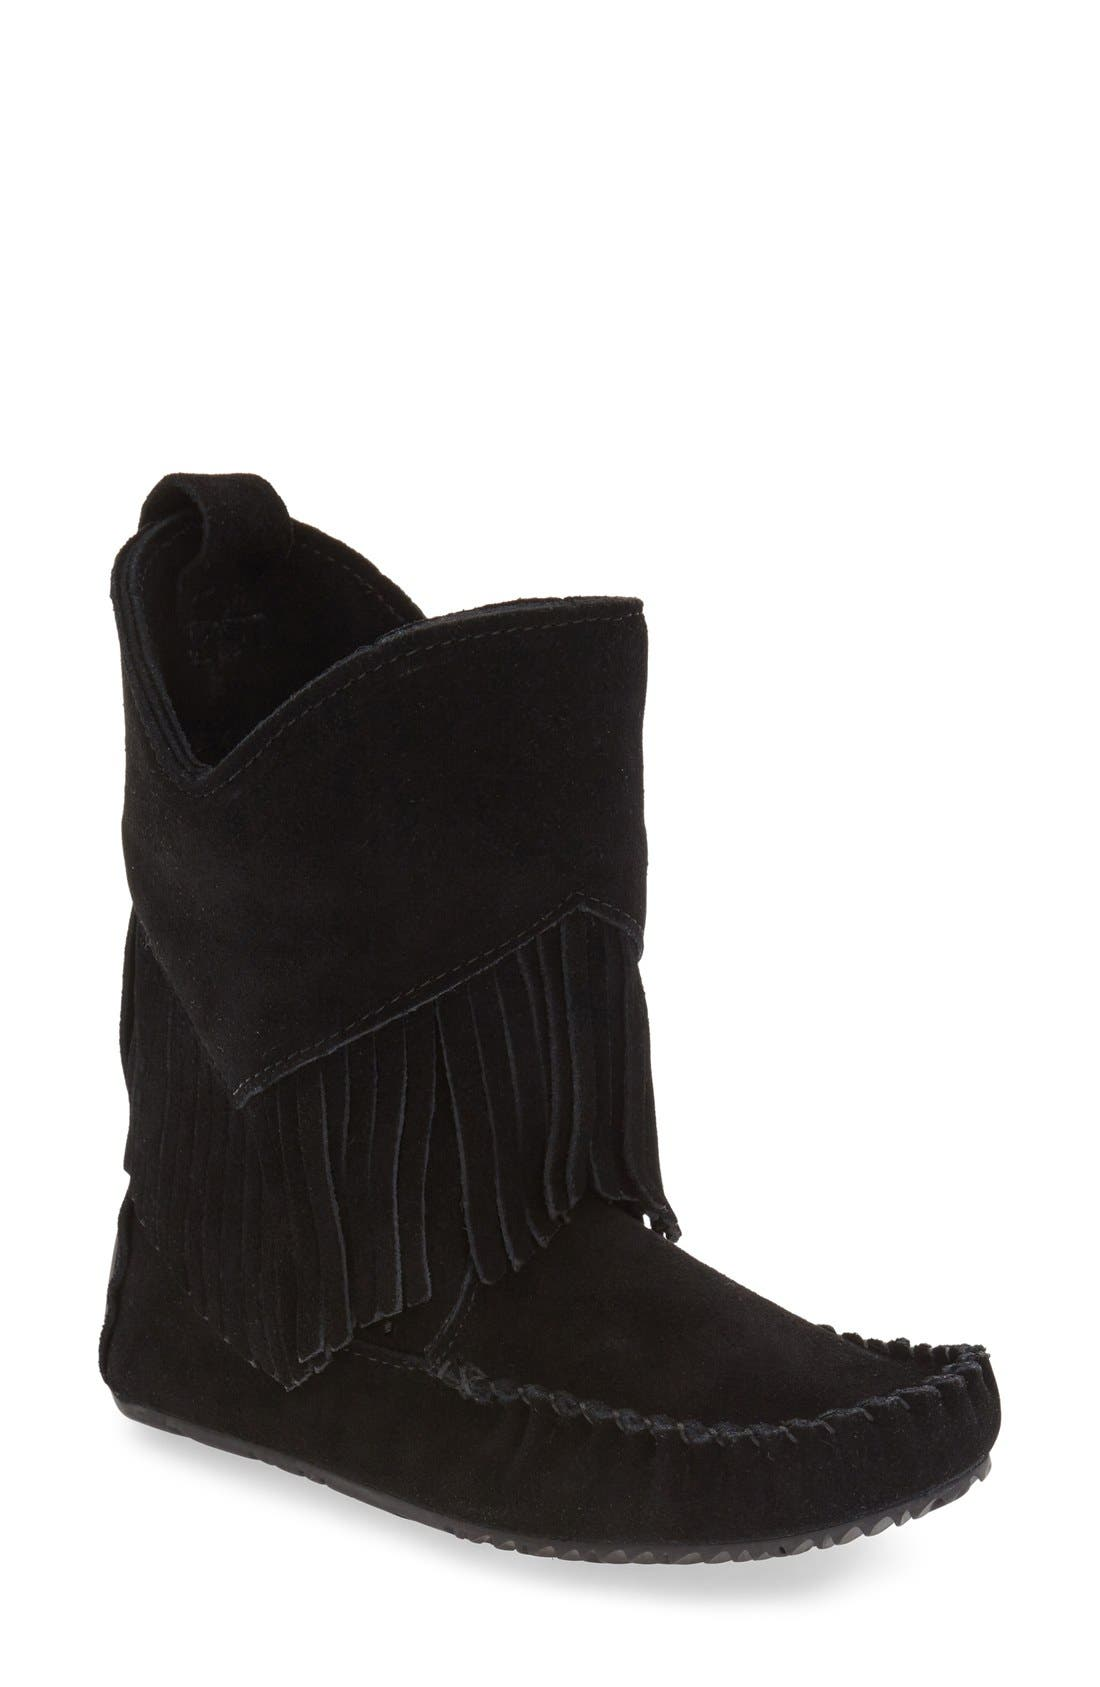 'Okotoks' Suede Boot,                         Main,                         color, 001